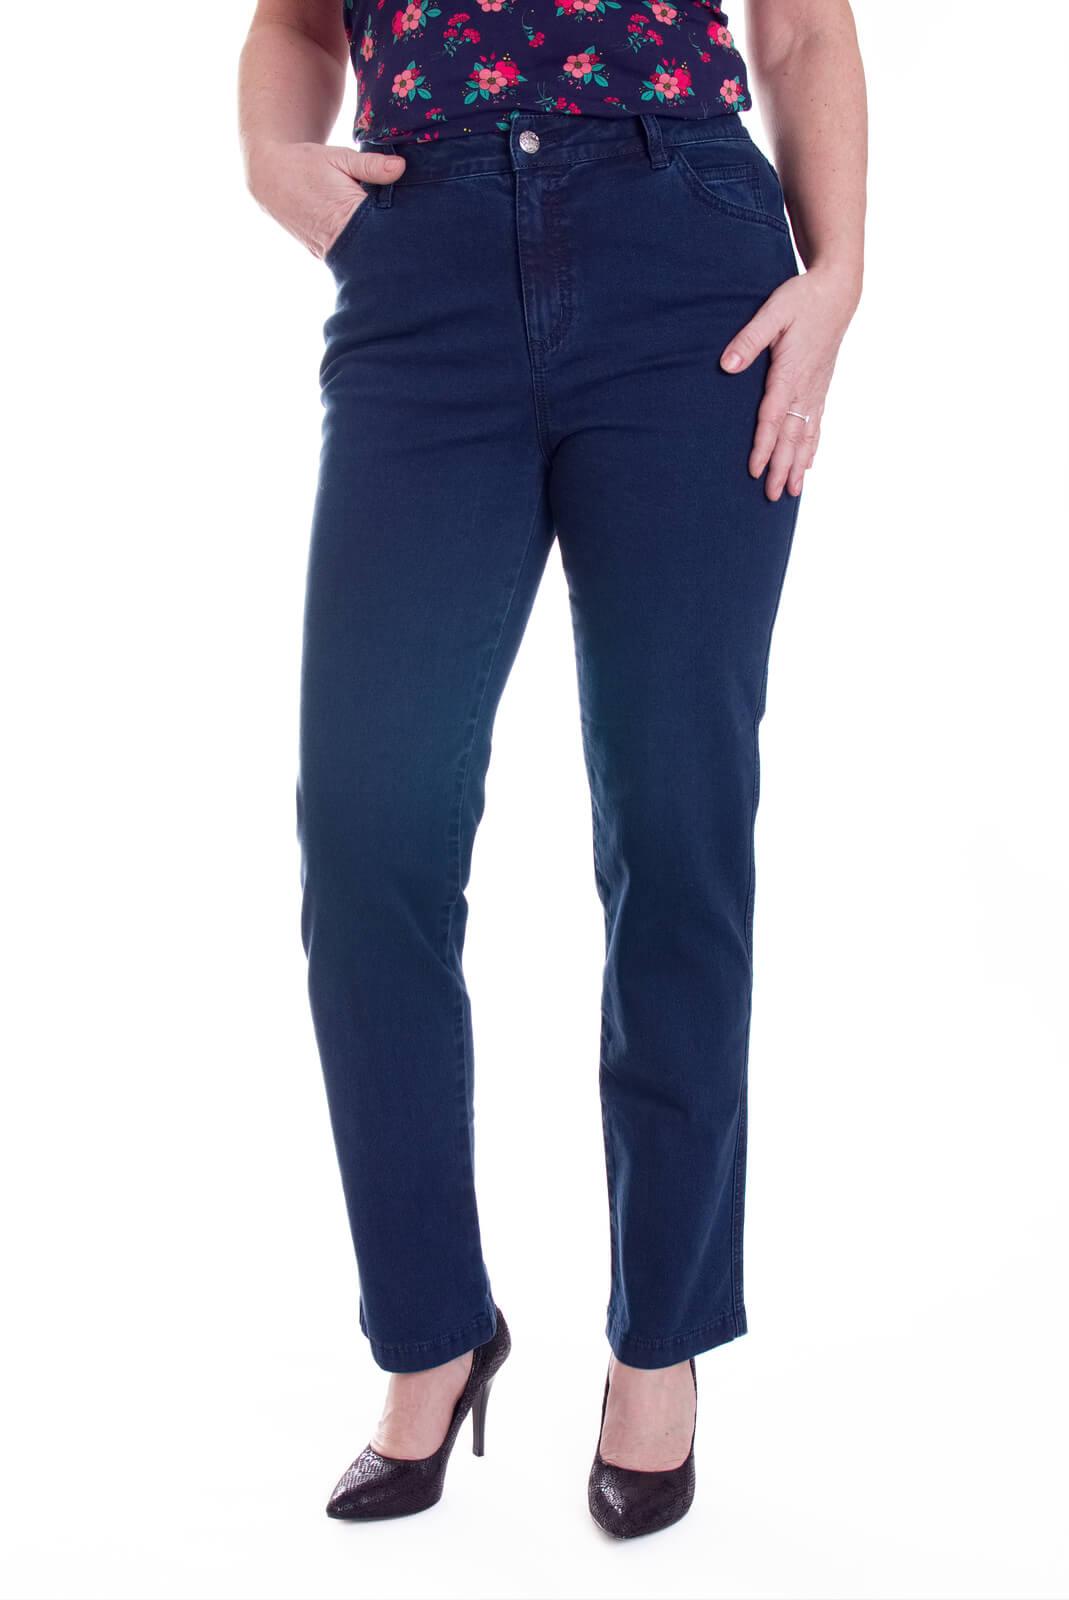 moda a jeansy - galerie - opravnaodevu.cz